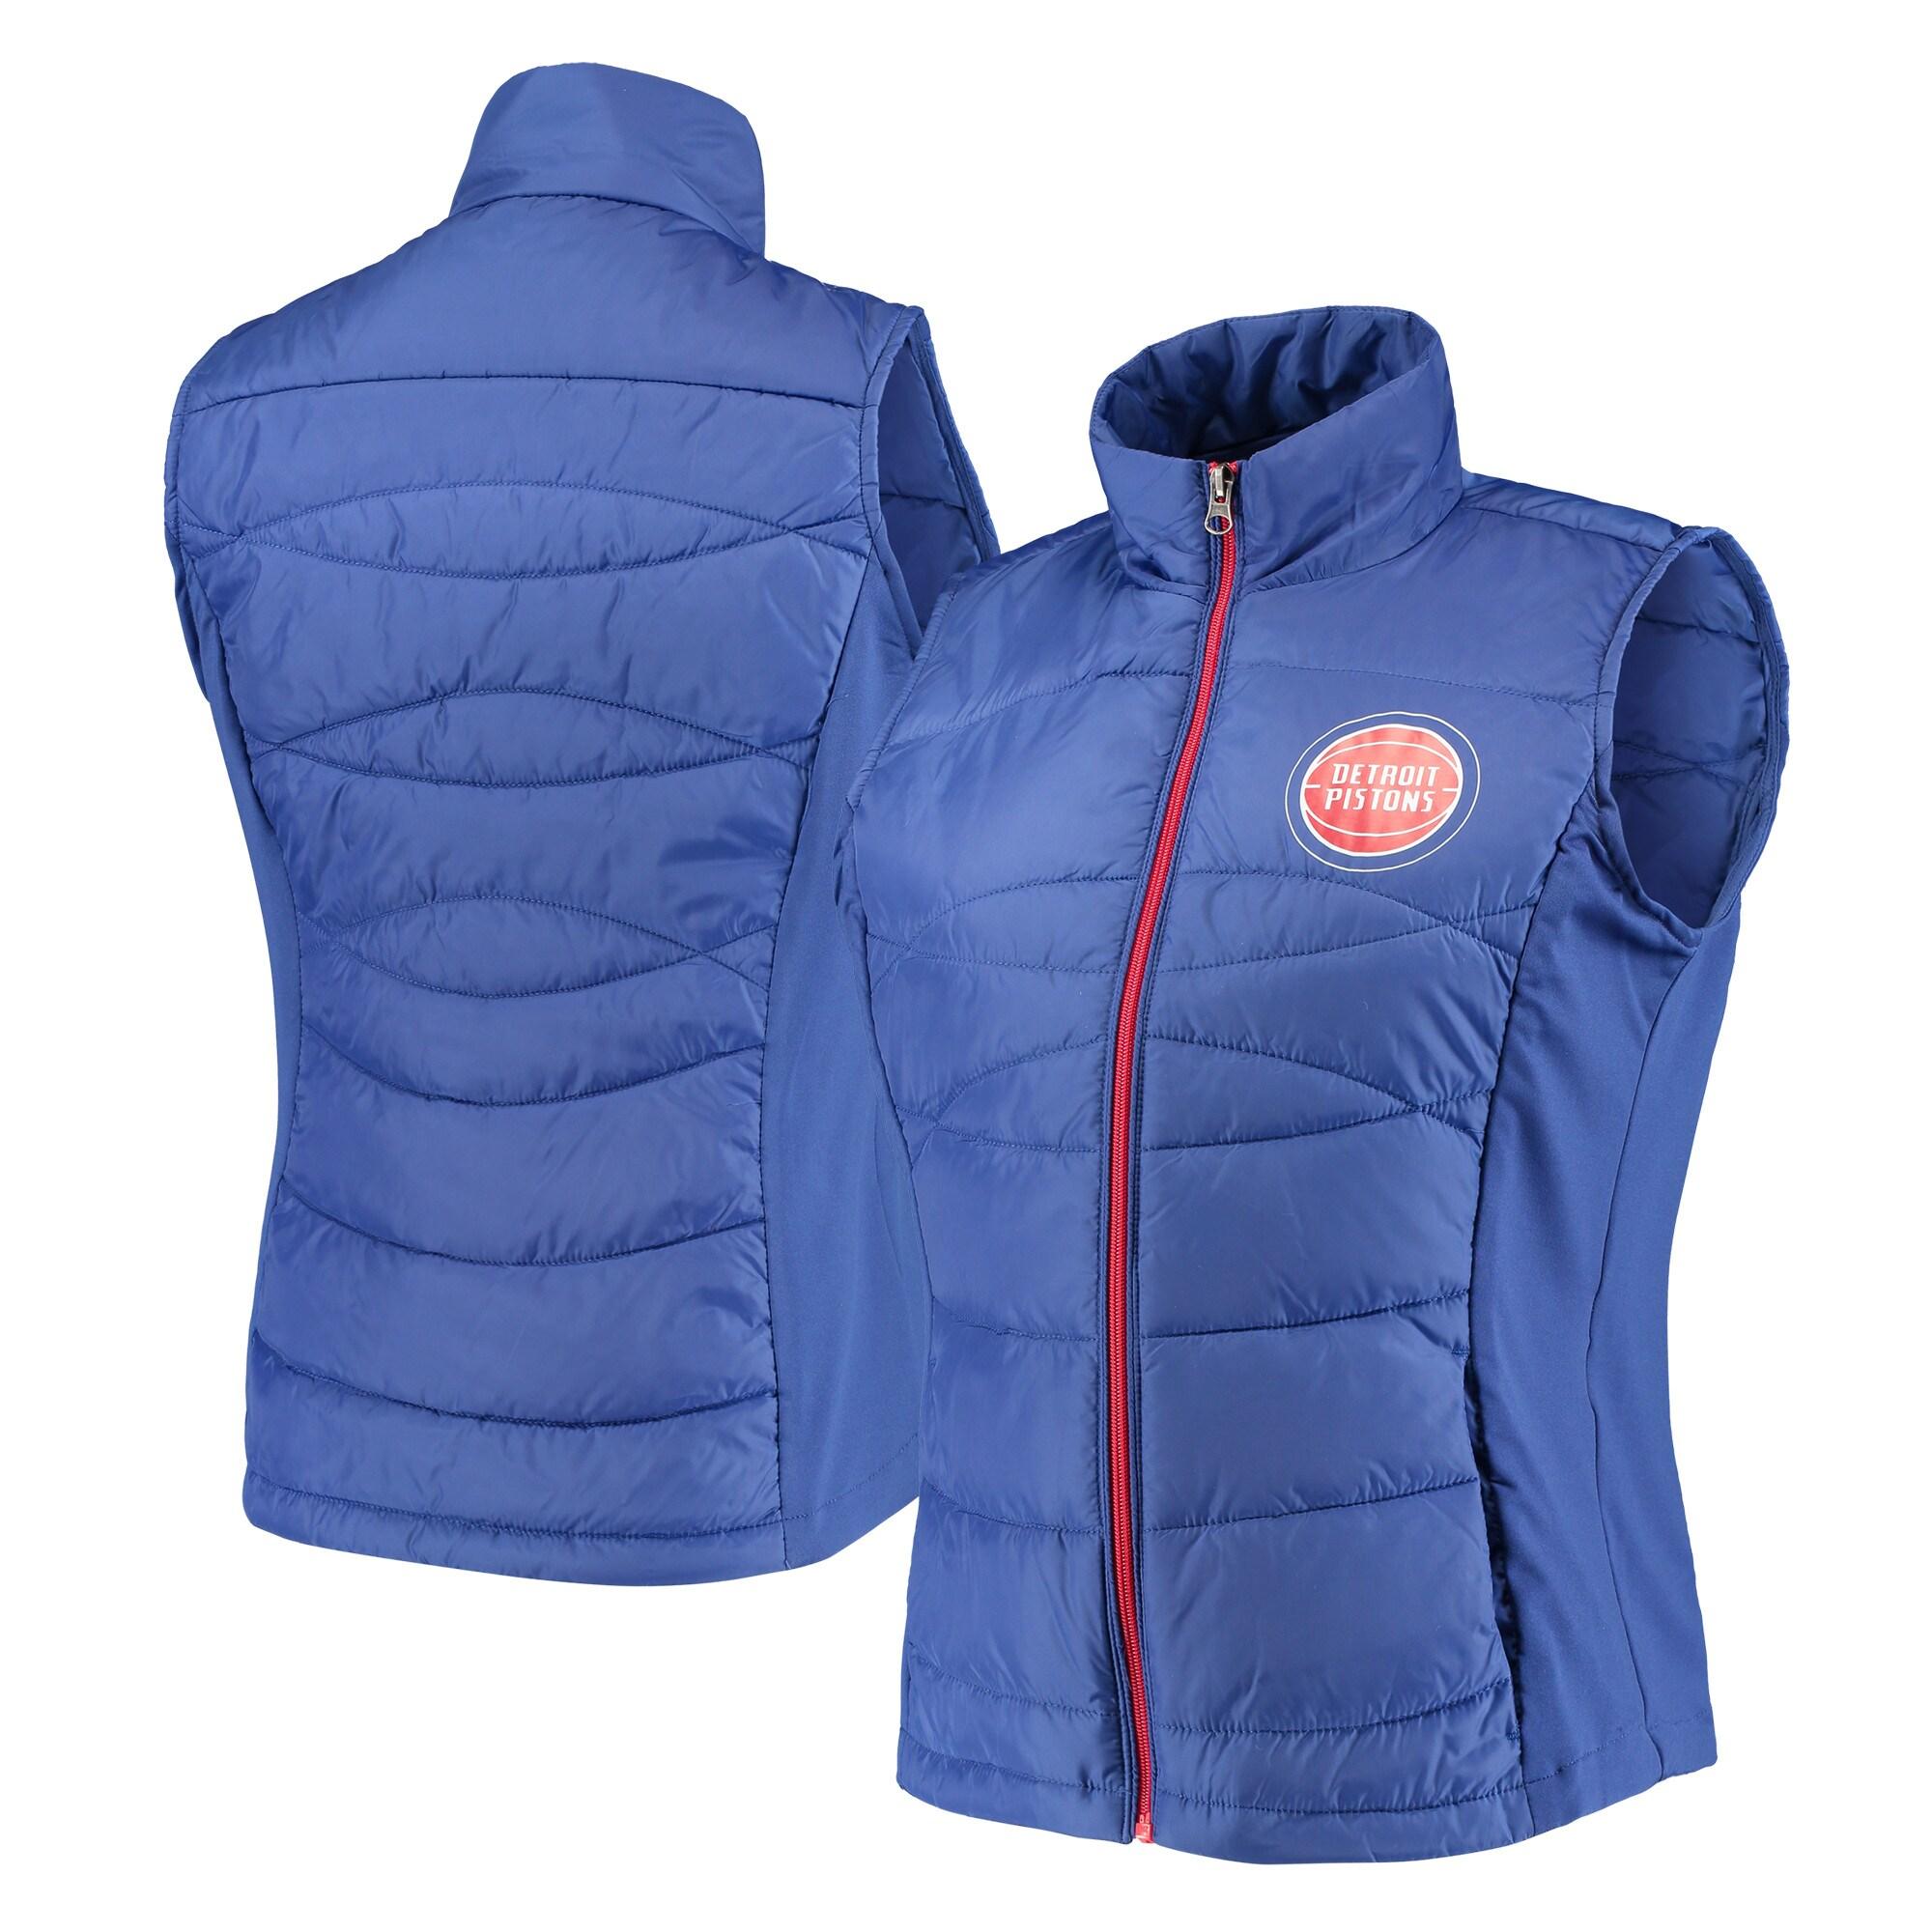 Detroit Pistons G-III 4Her by Carl Banks Women's Wing Back Lightweight Polyfill Vest - Blue